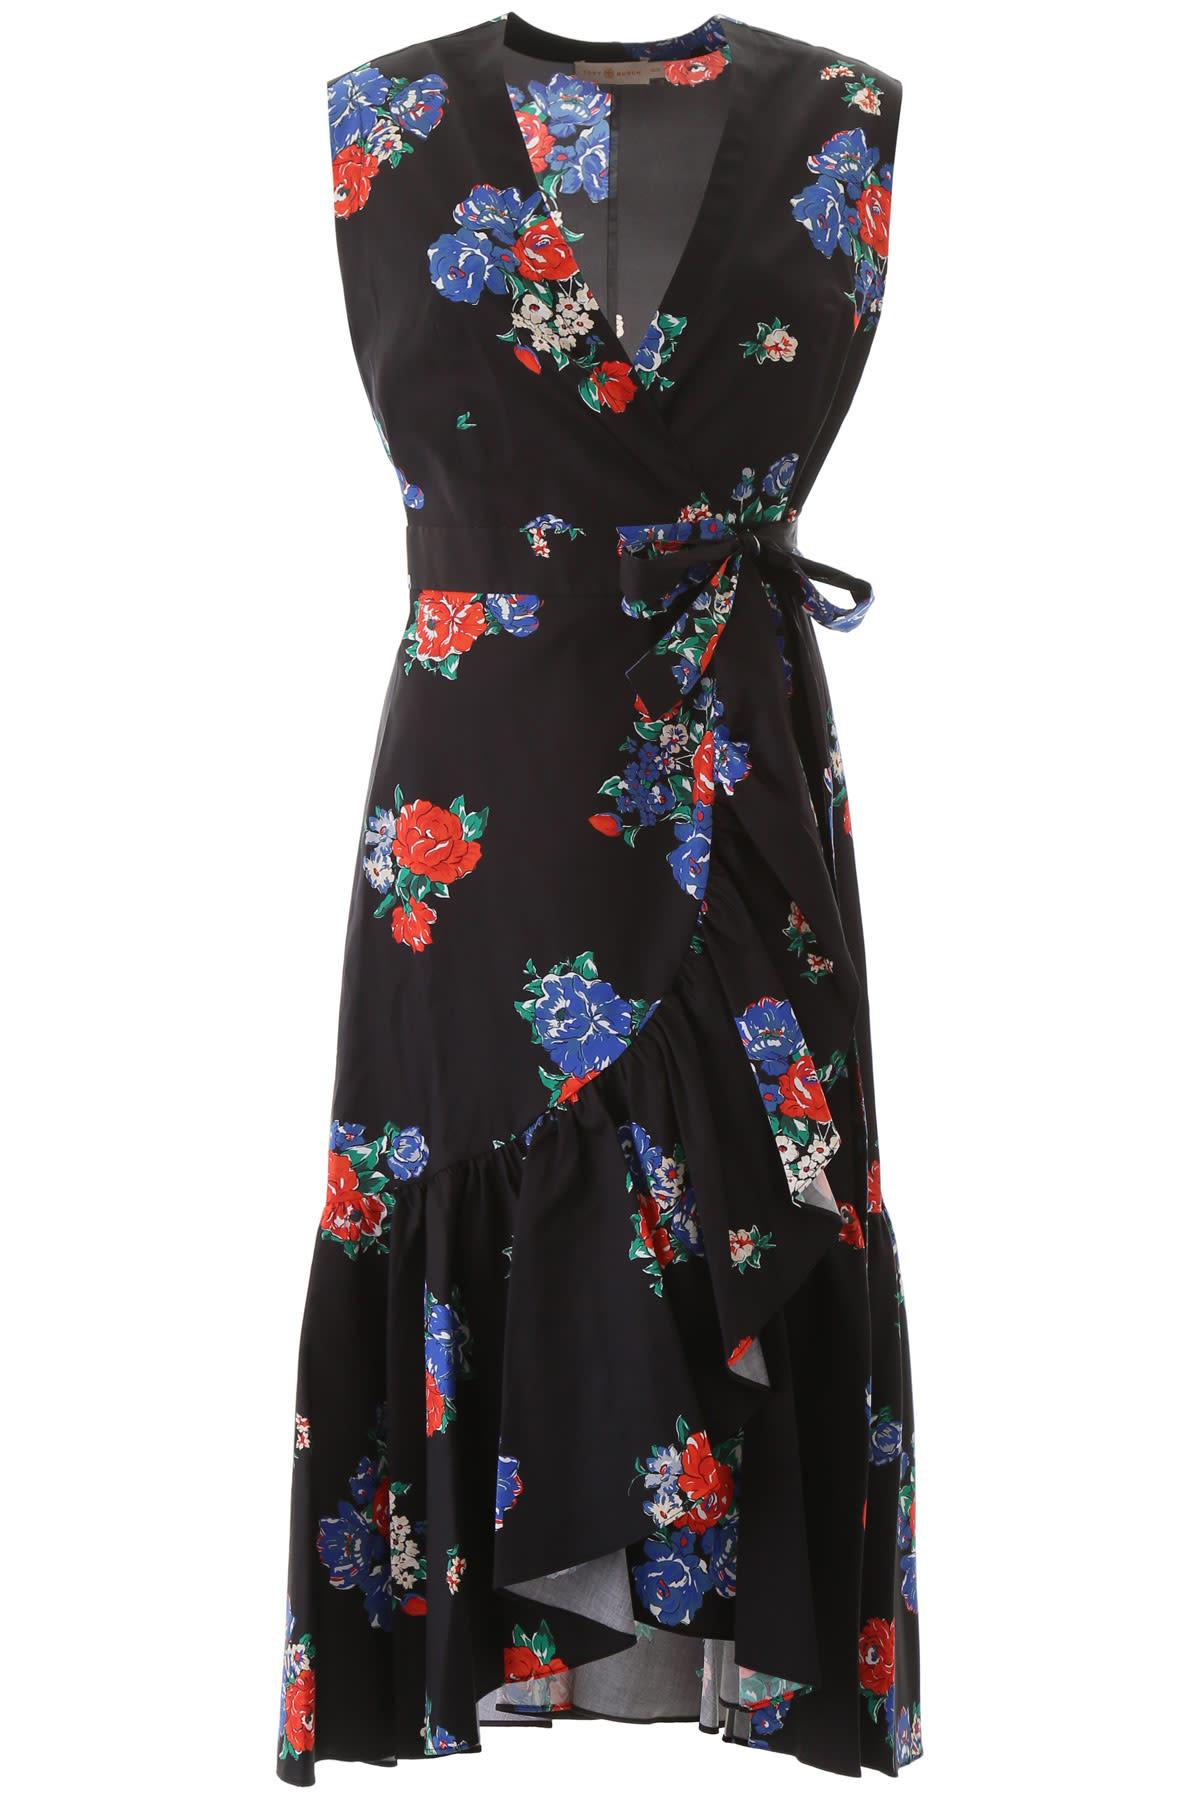 Buy Tory Burch Flower Print Wrap Dress online, shop Tory Burch with free shipping